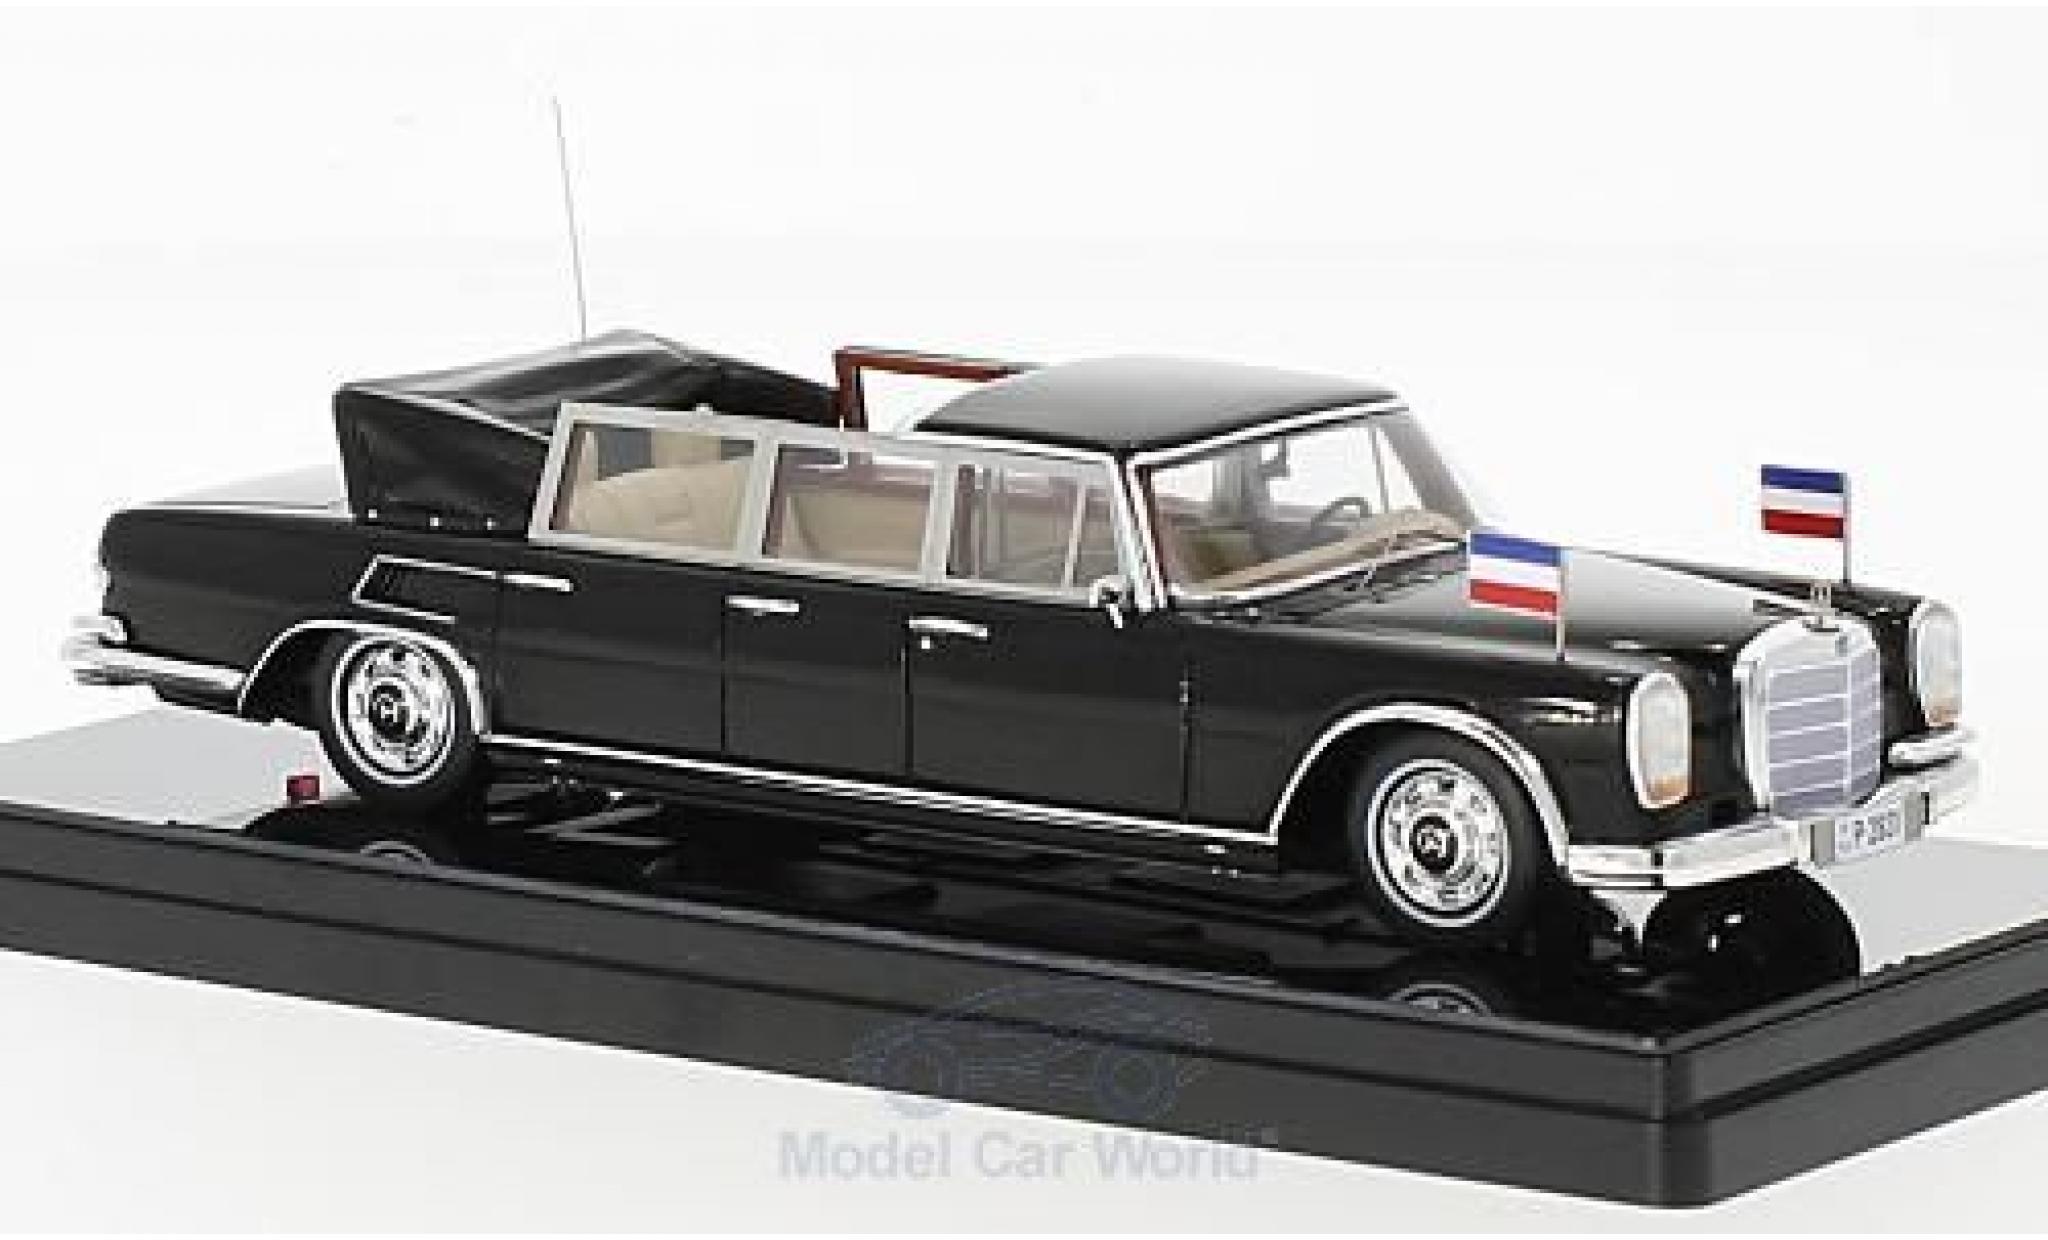 Mercedes 600 Pullmann 1/43 TrueScale Miniatures Landaulet noire Josip Broz Tito President of Yugoslavia 1967